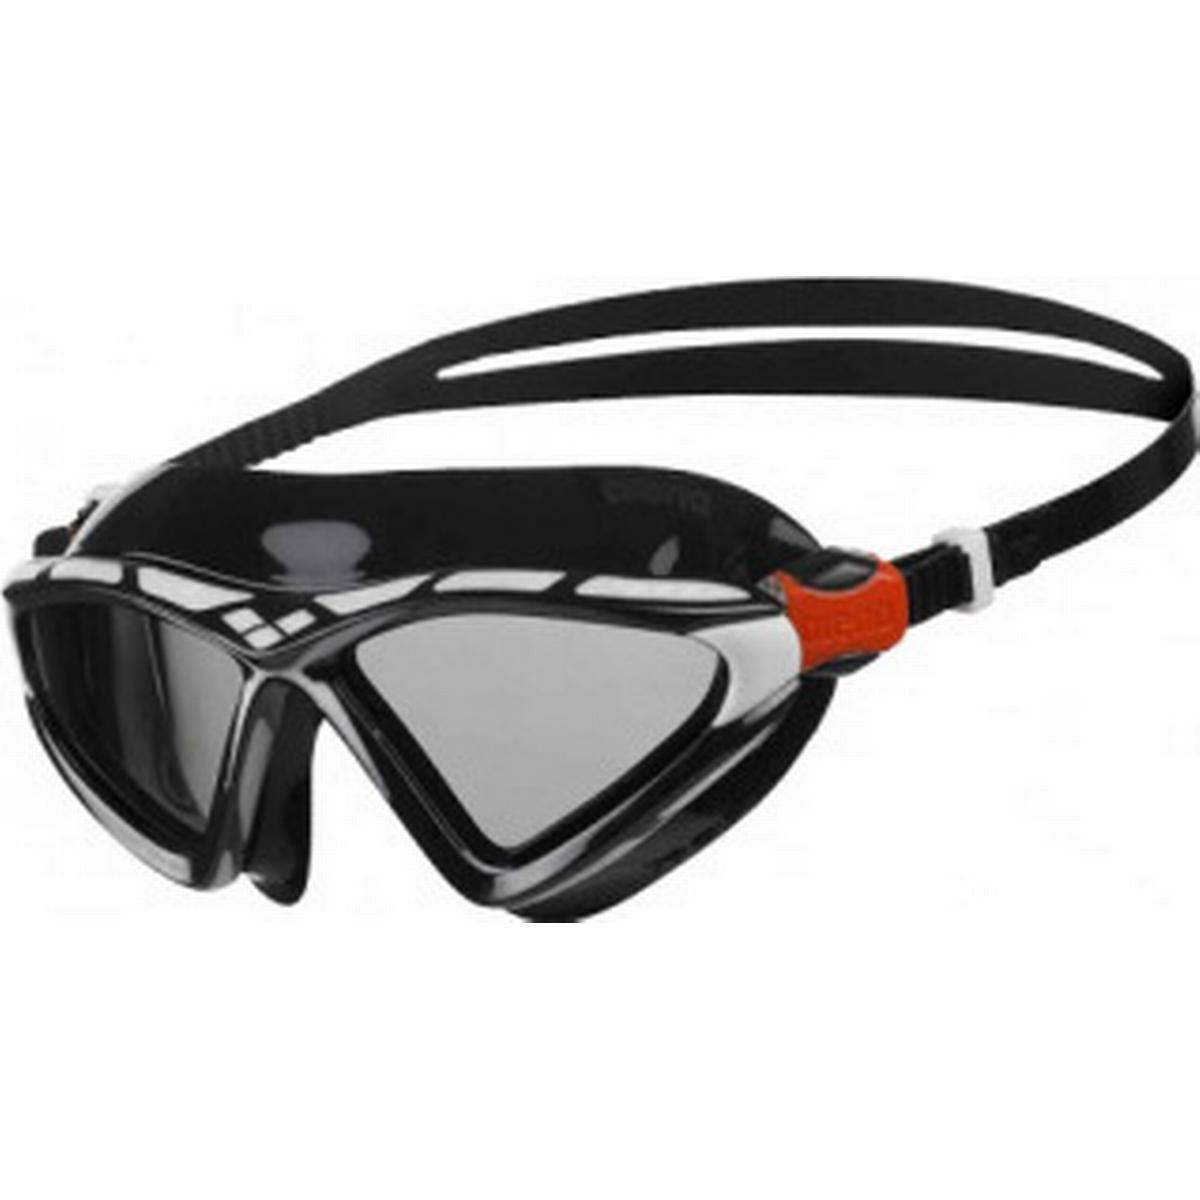 b051e9446f0 Arena Svømmebriller - Sammenlign priser hos PriceRunner